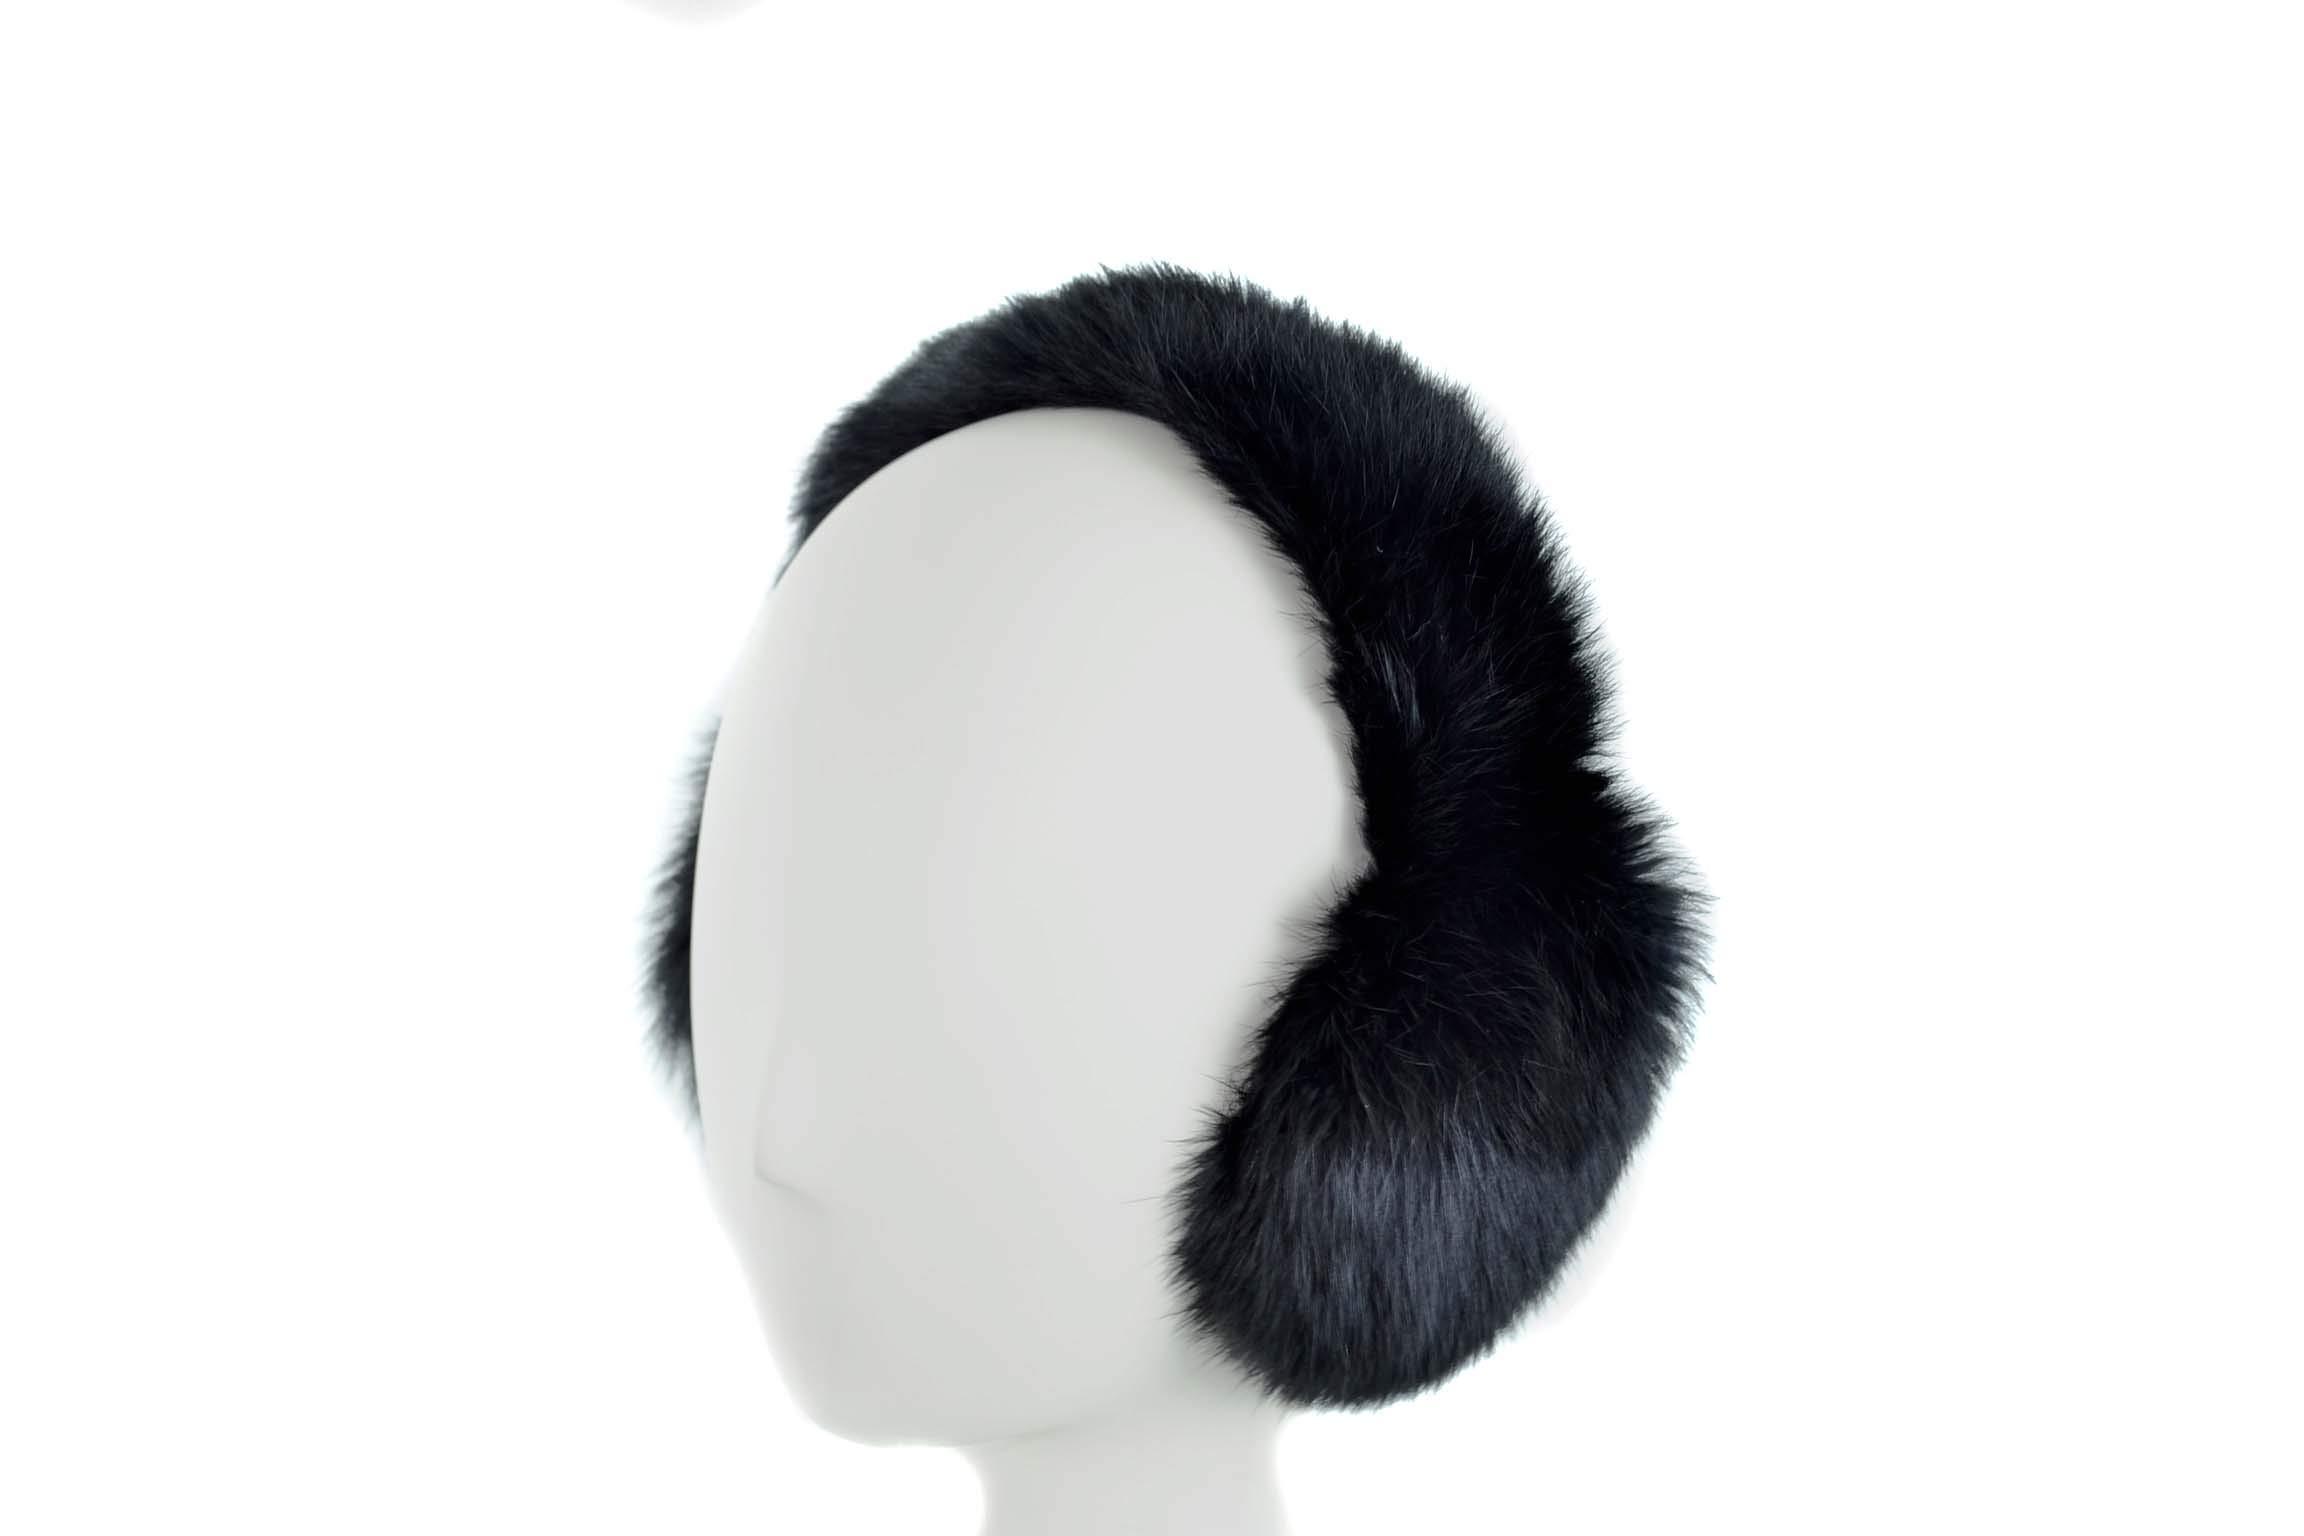 Surell Genuine Black Rabbit Fur Earmuffs with Soft All Fur Non Adjustable Band, Winter Fashion Ear Warmers, Perfect Elegant Women's Luxury Gift